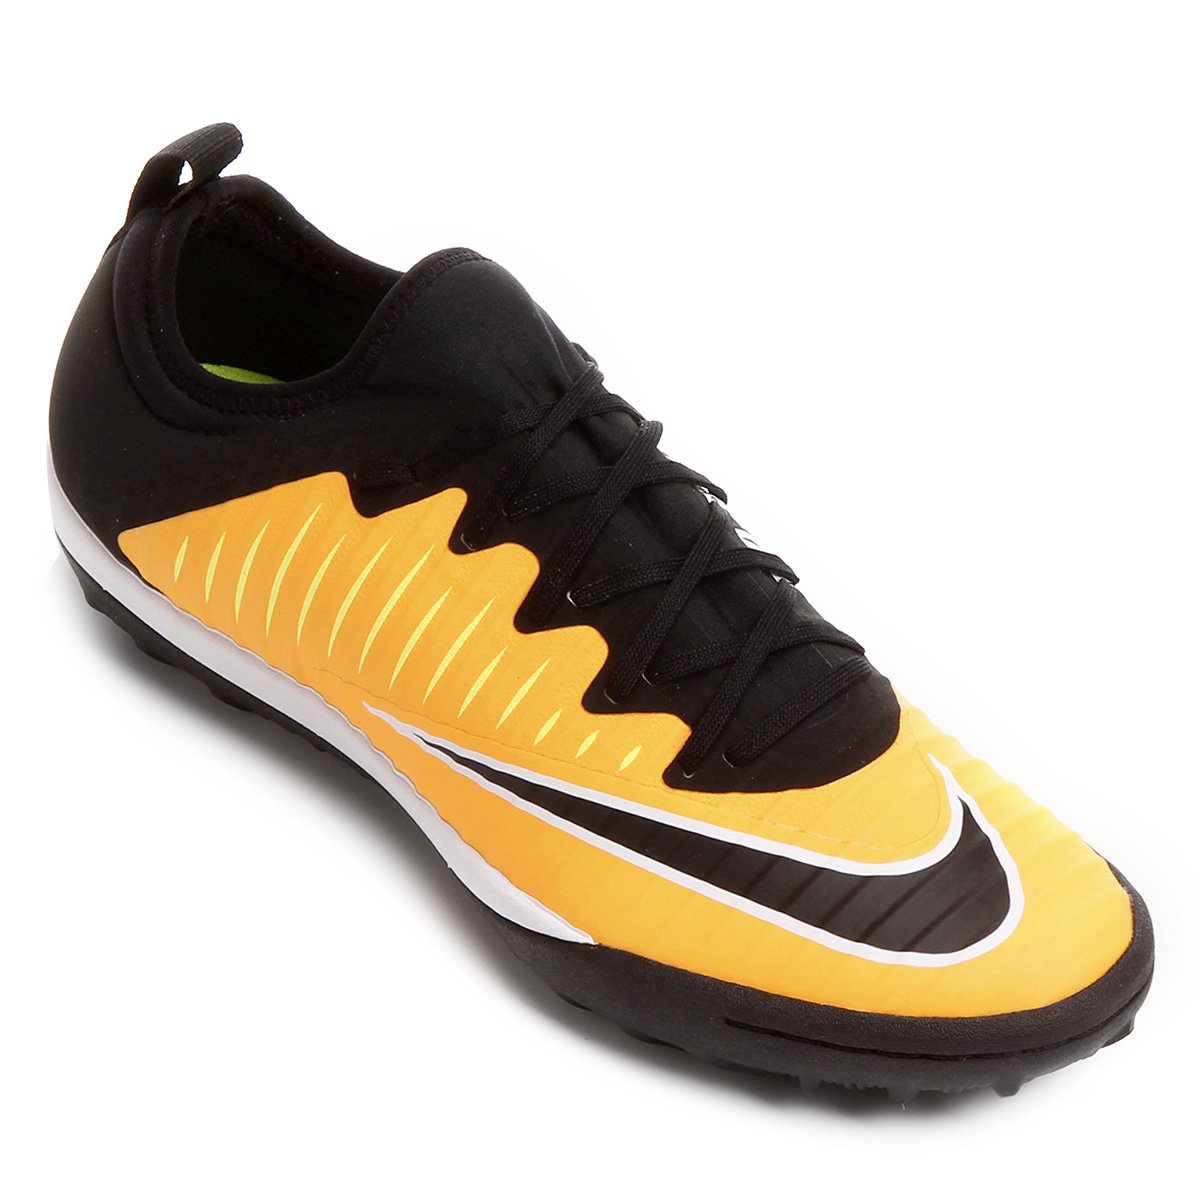 197c9d1e3e Chuteira Society Nike Mercurial Finale 2 TF - Laranja e Preto ...